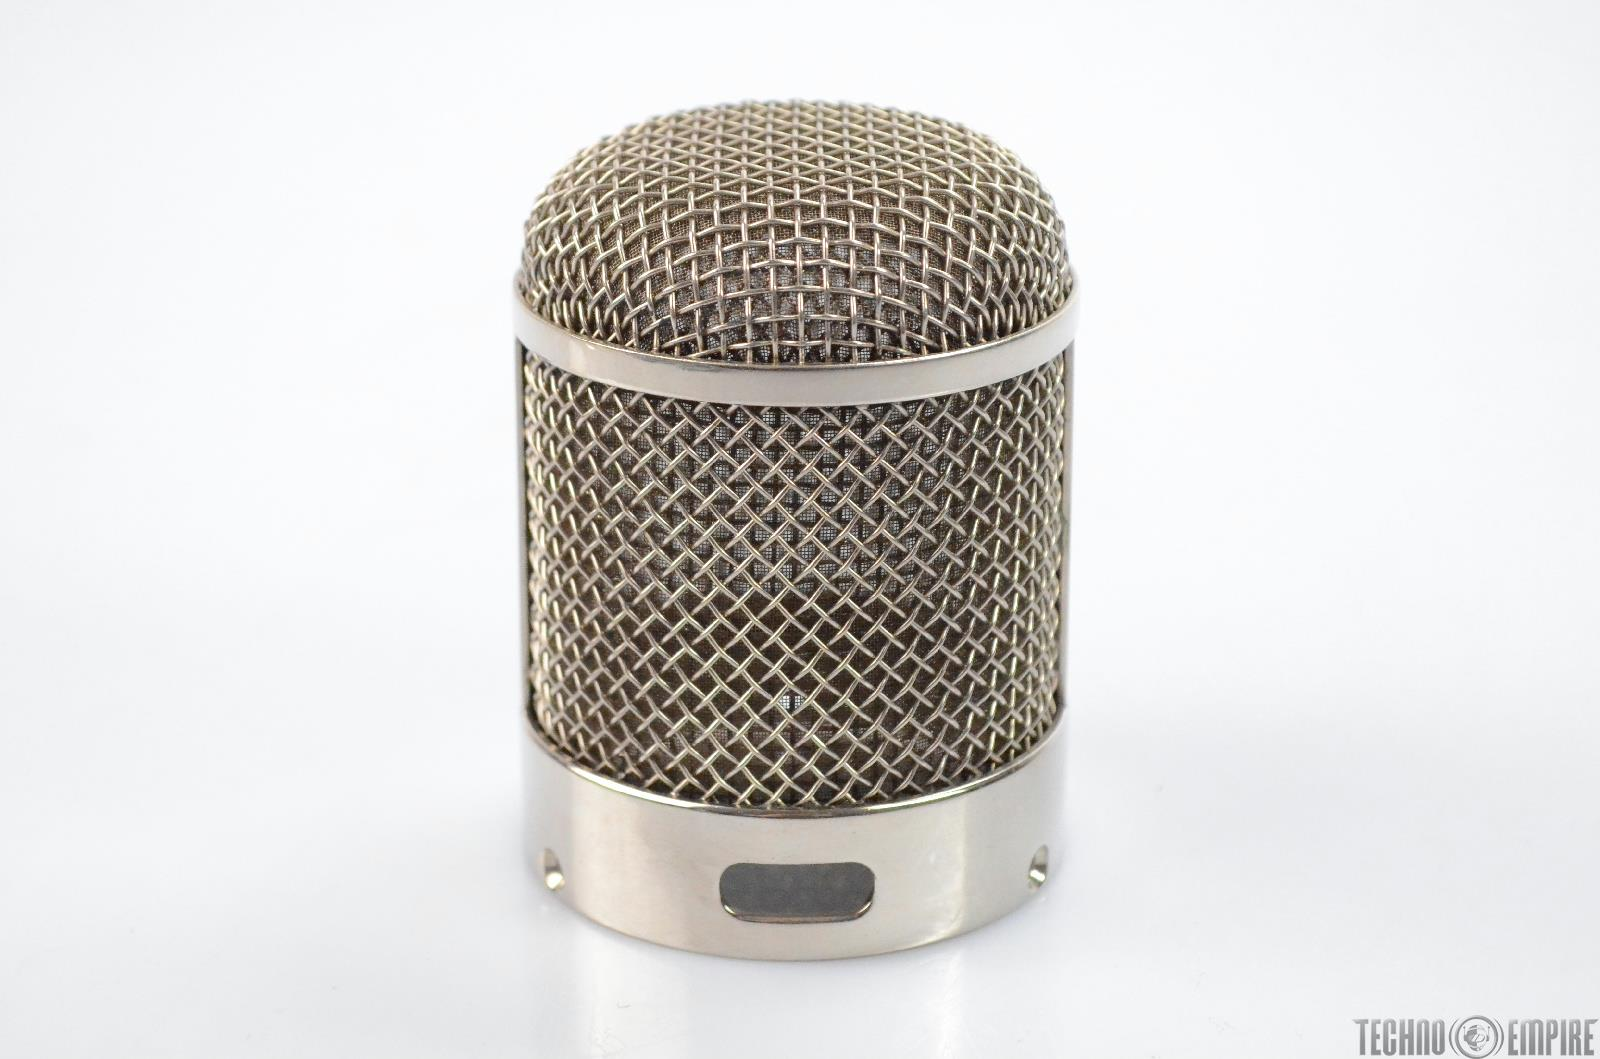 Neumann U-47 Clone Style Microphone Replacement Head Basket Grill U47 #31030